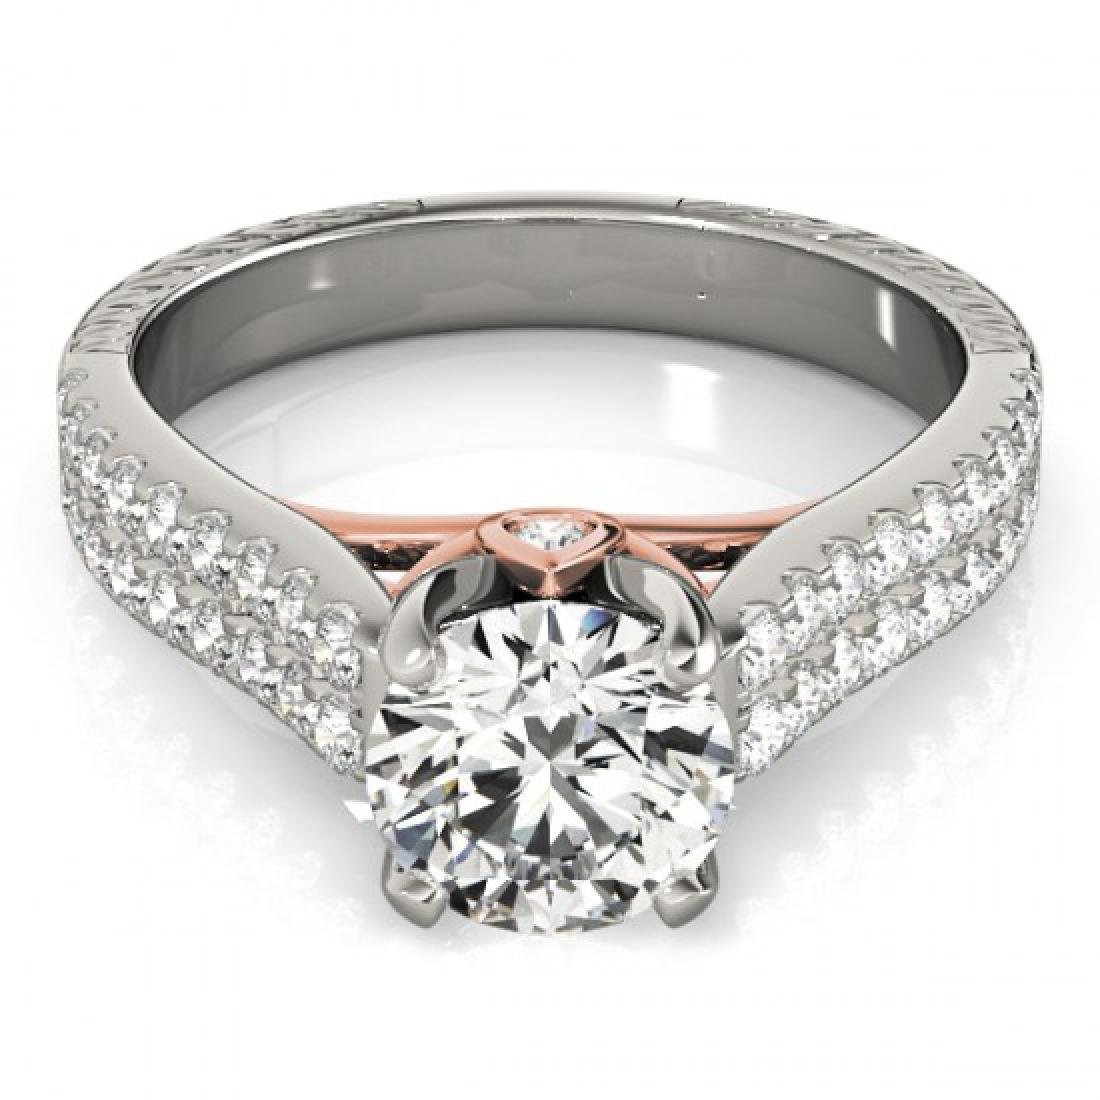 1.61 CTW Certified VS/SI Diamond Pave Ring 18K White &